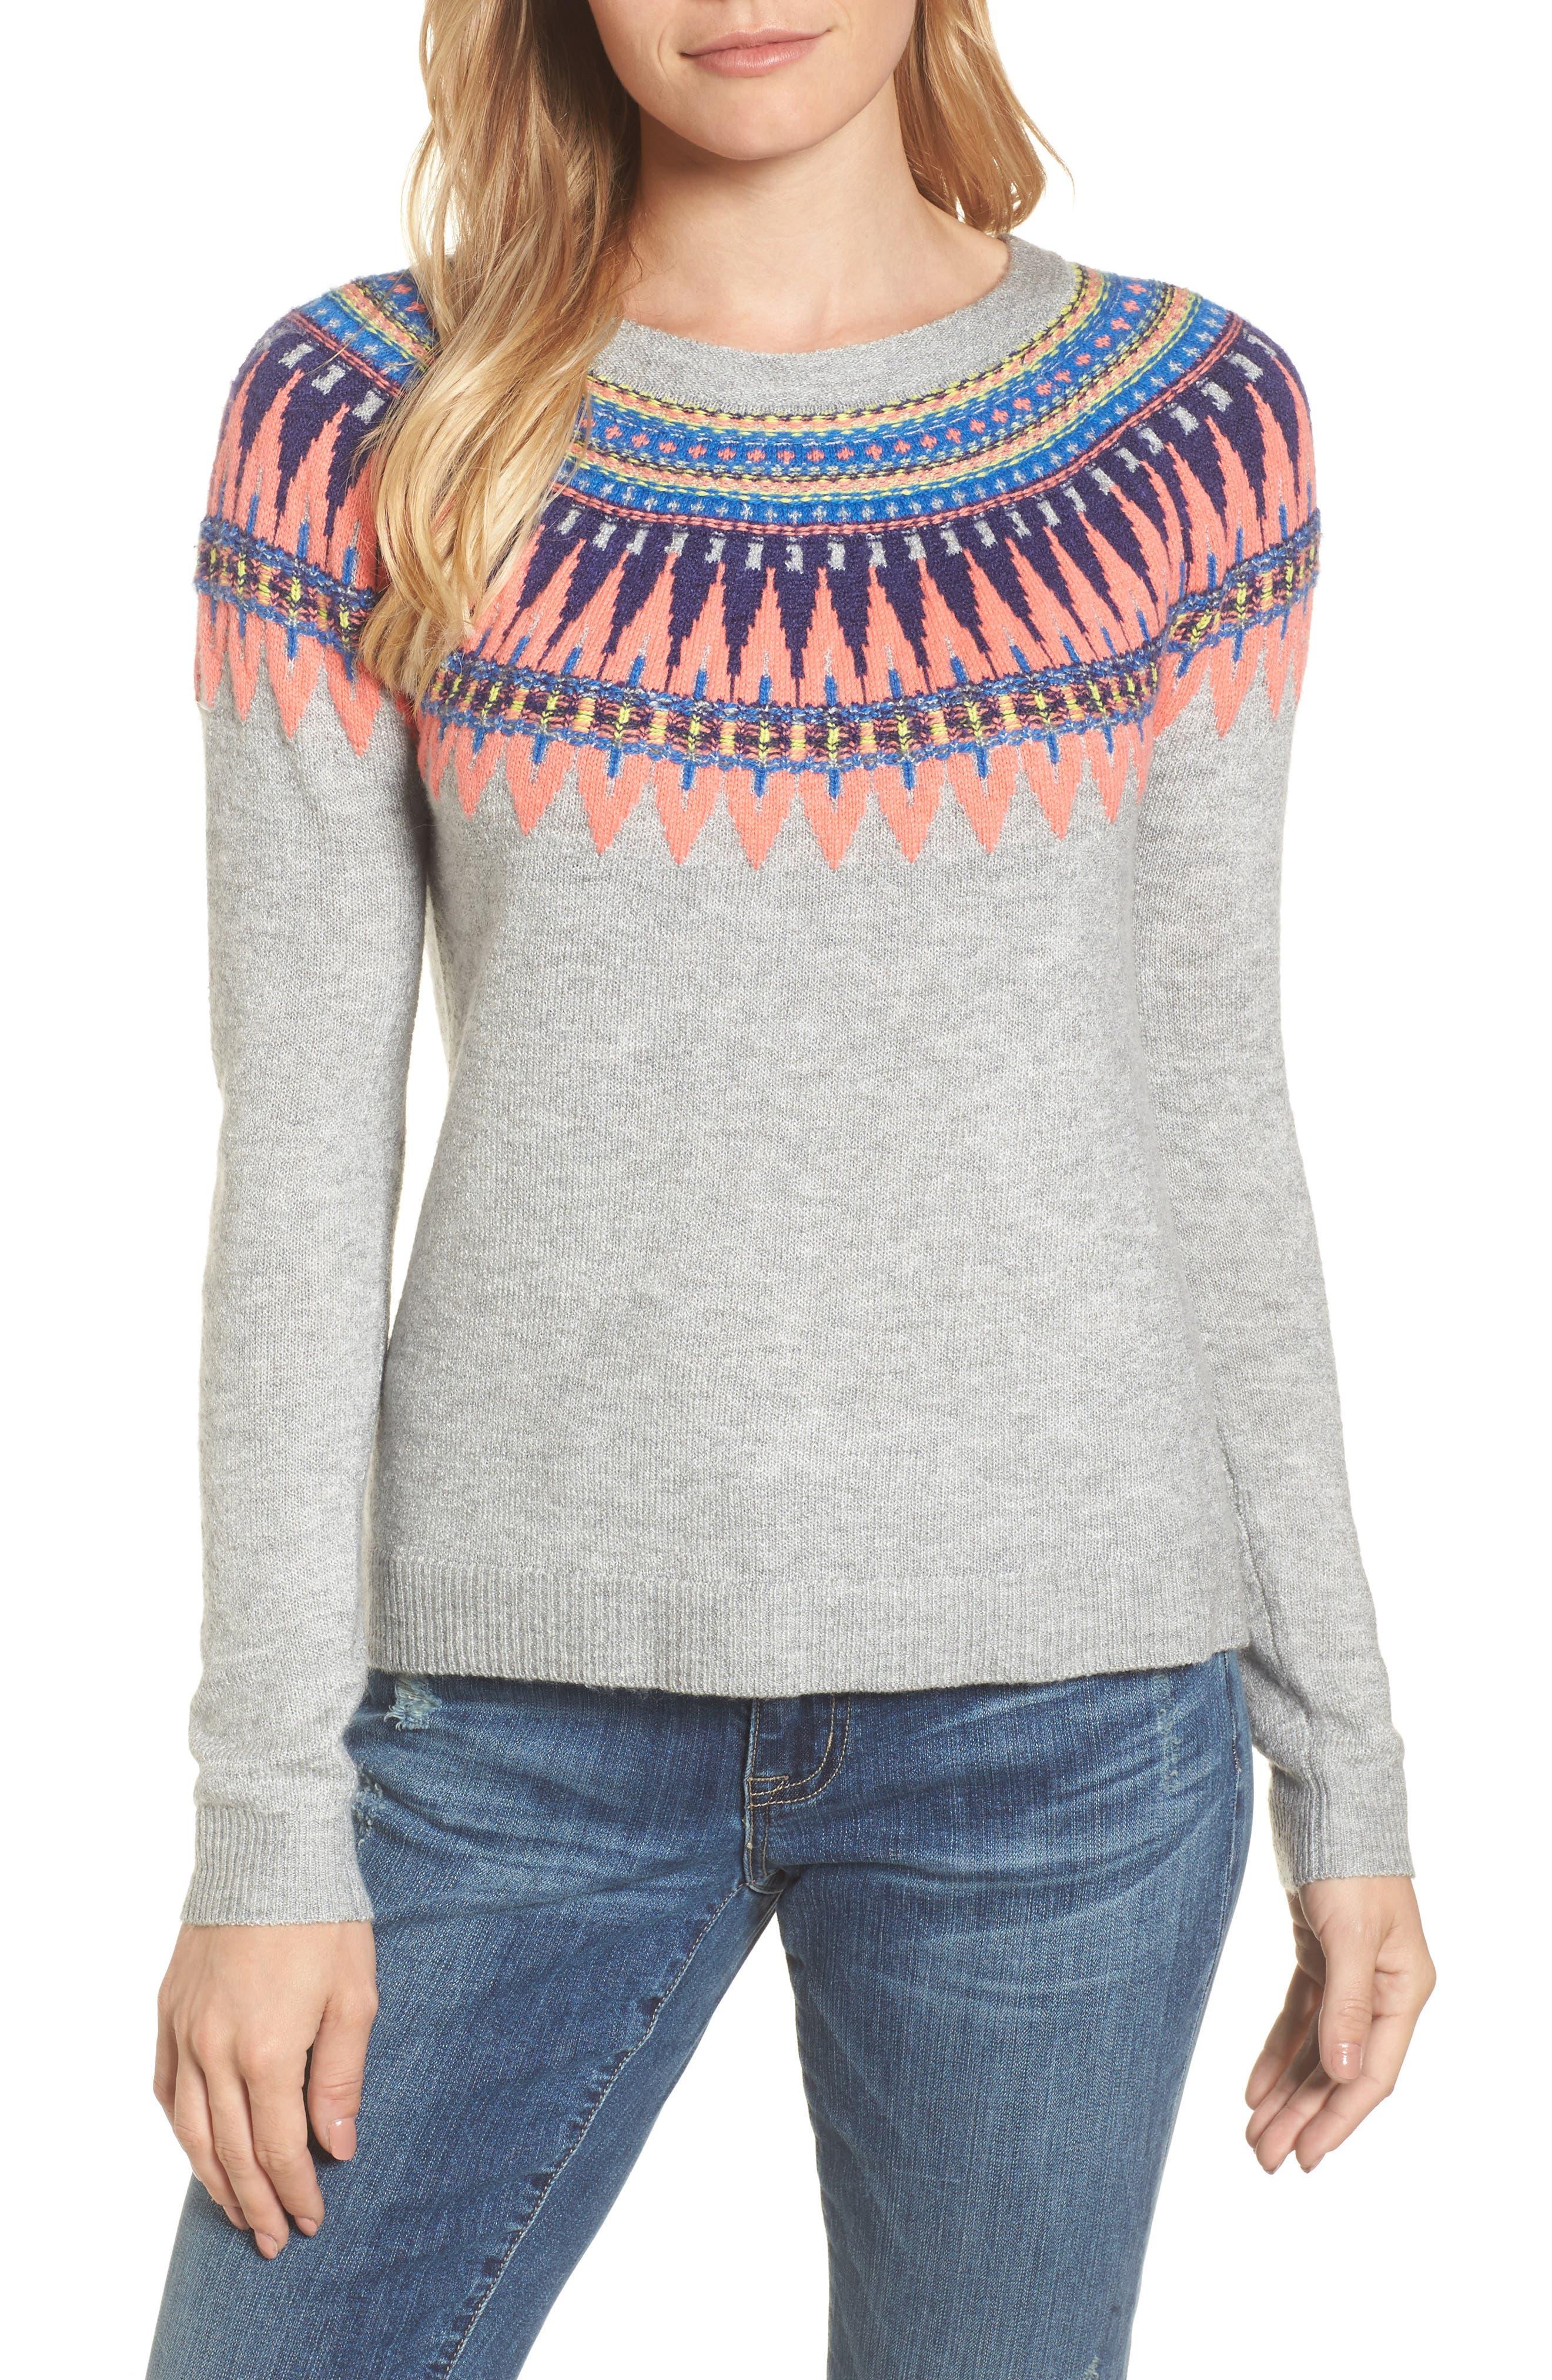 Alternate Image 1 Selected - Caslon® Tie Back Patterned Sweater (Regular & Petite)